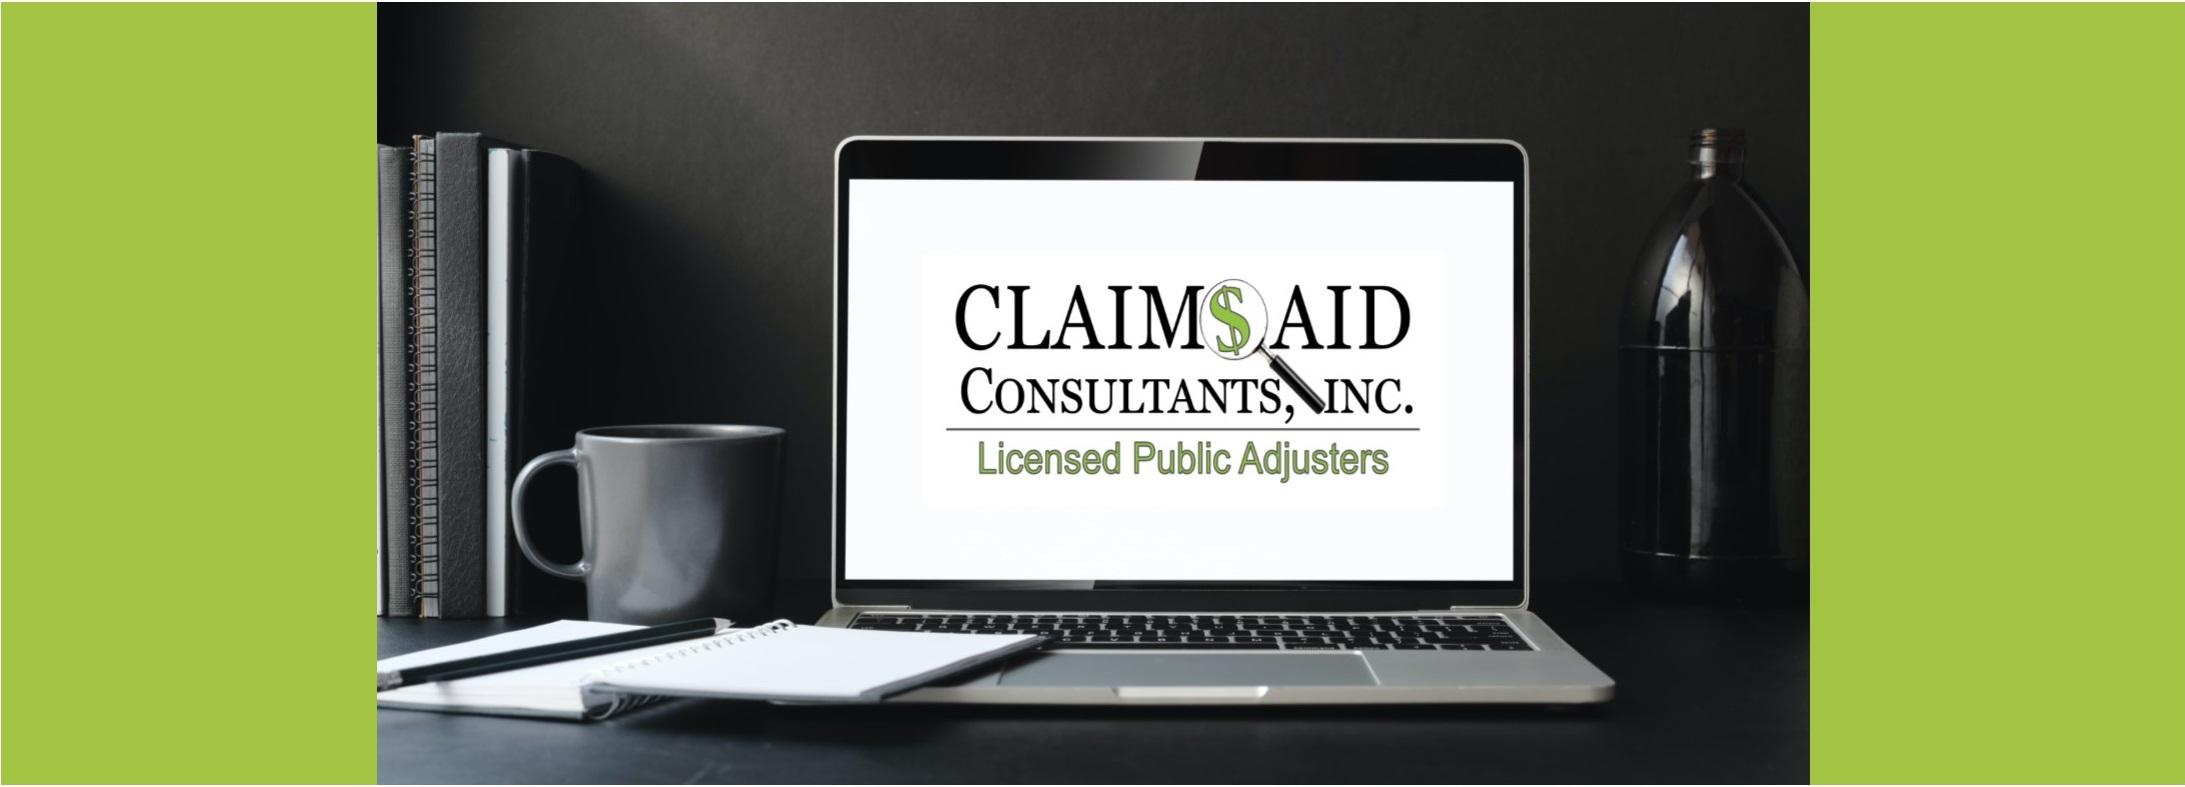 Claims Aid Consultants Public Adjusters